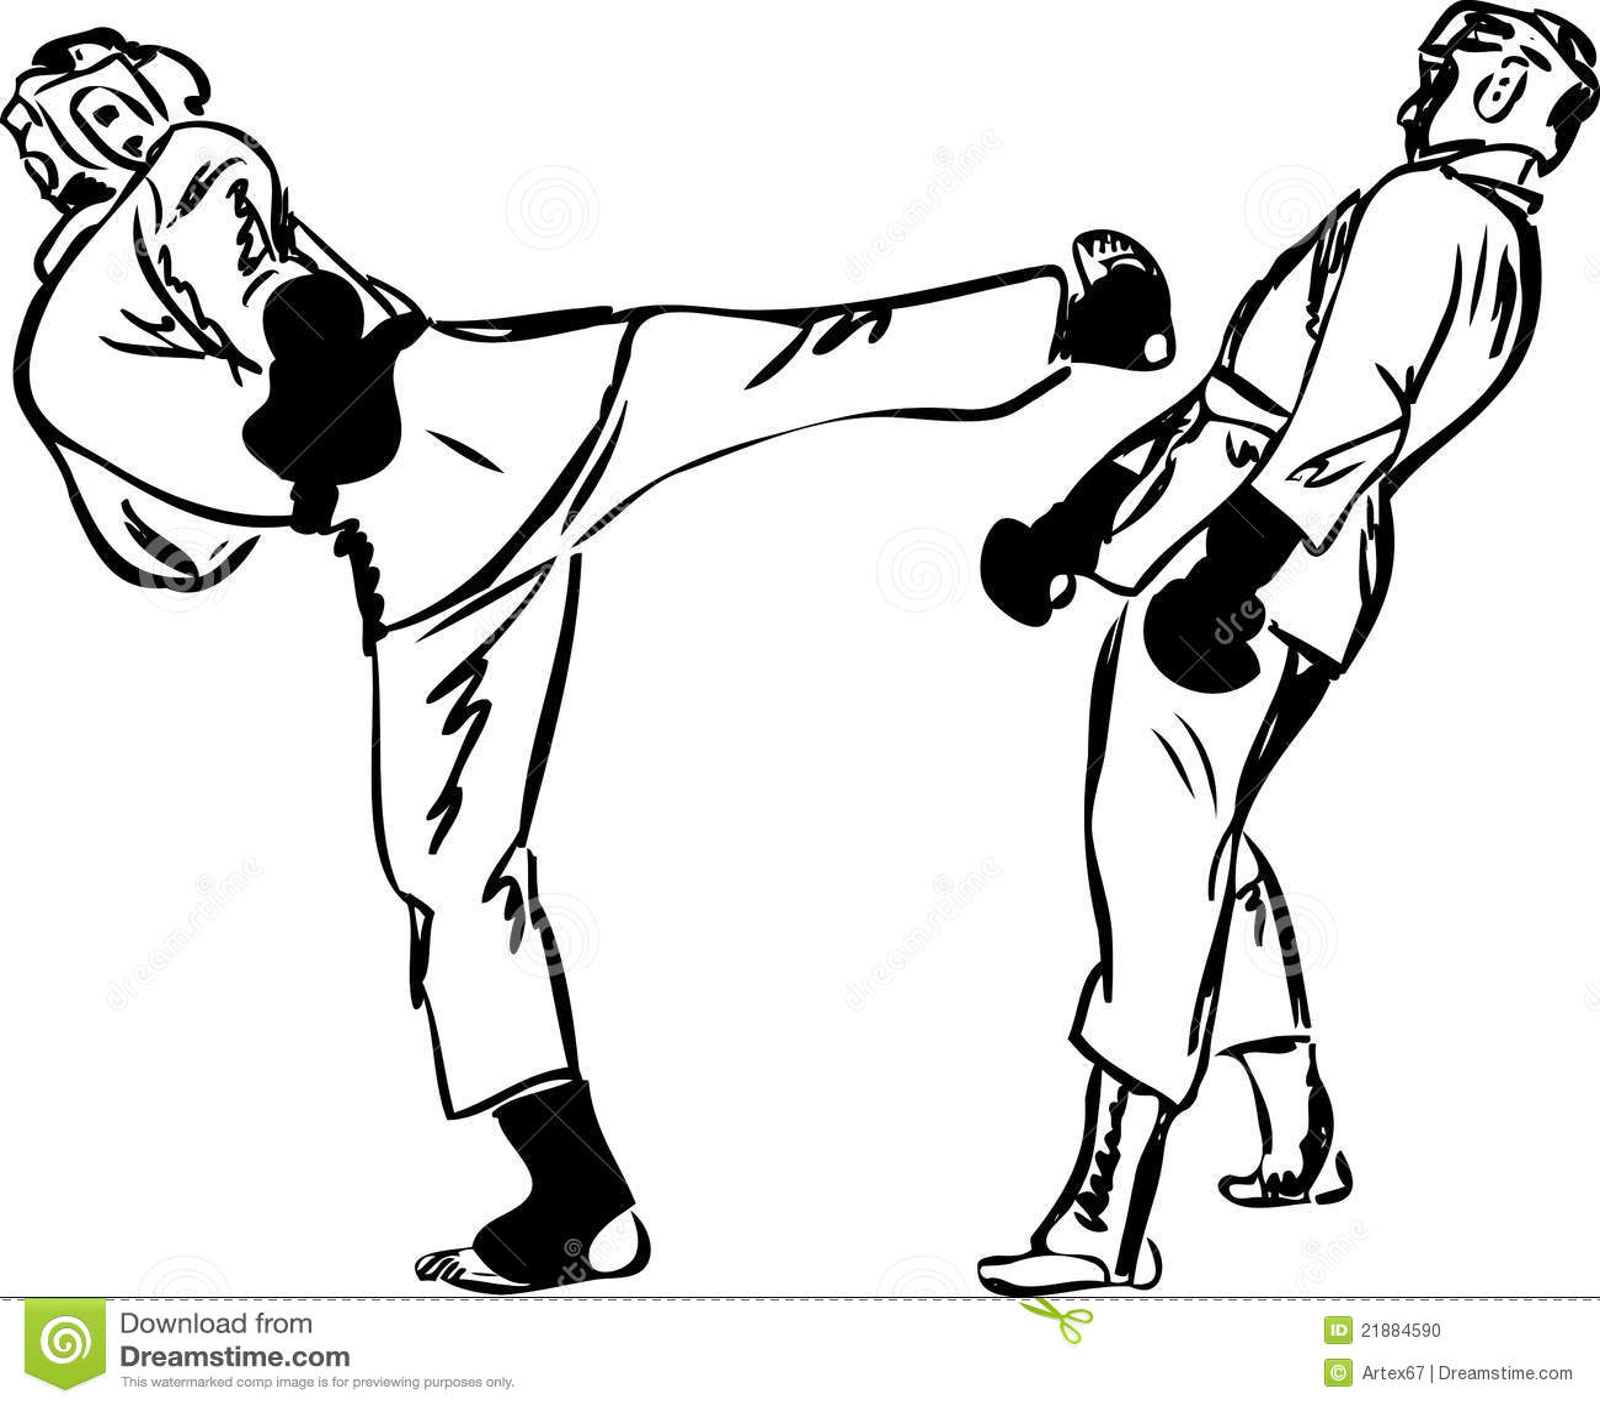 Esportes Das Artes Marciais De Kyokushinkai Do Karate